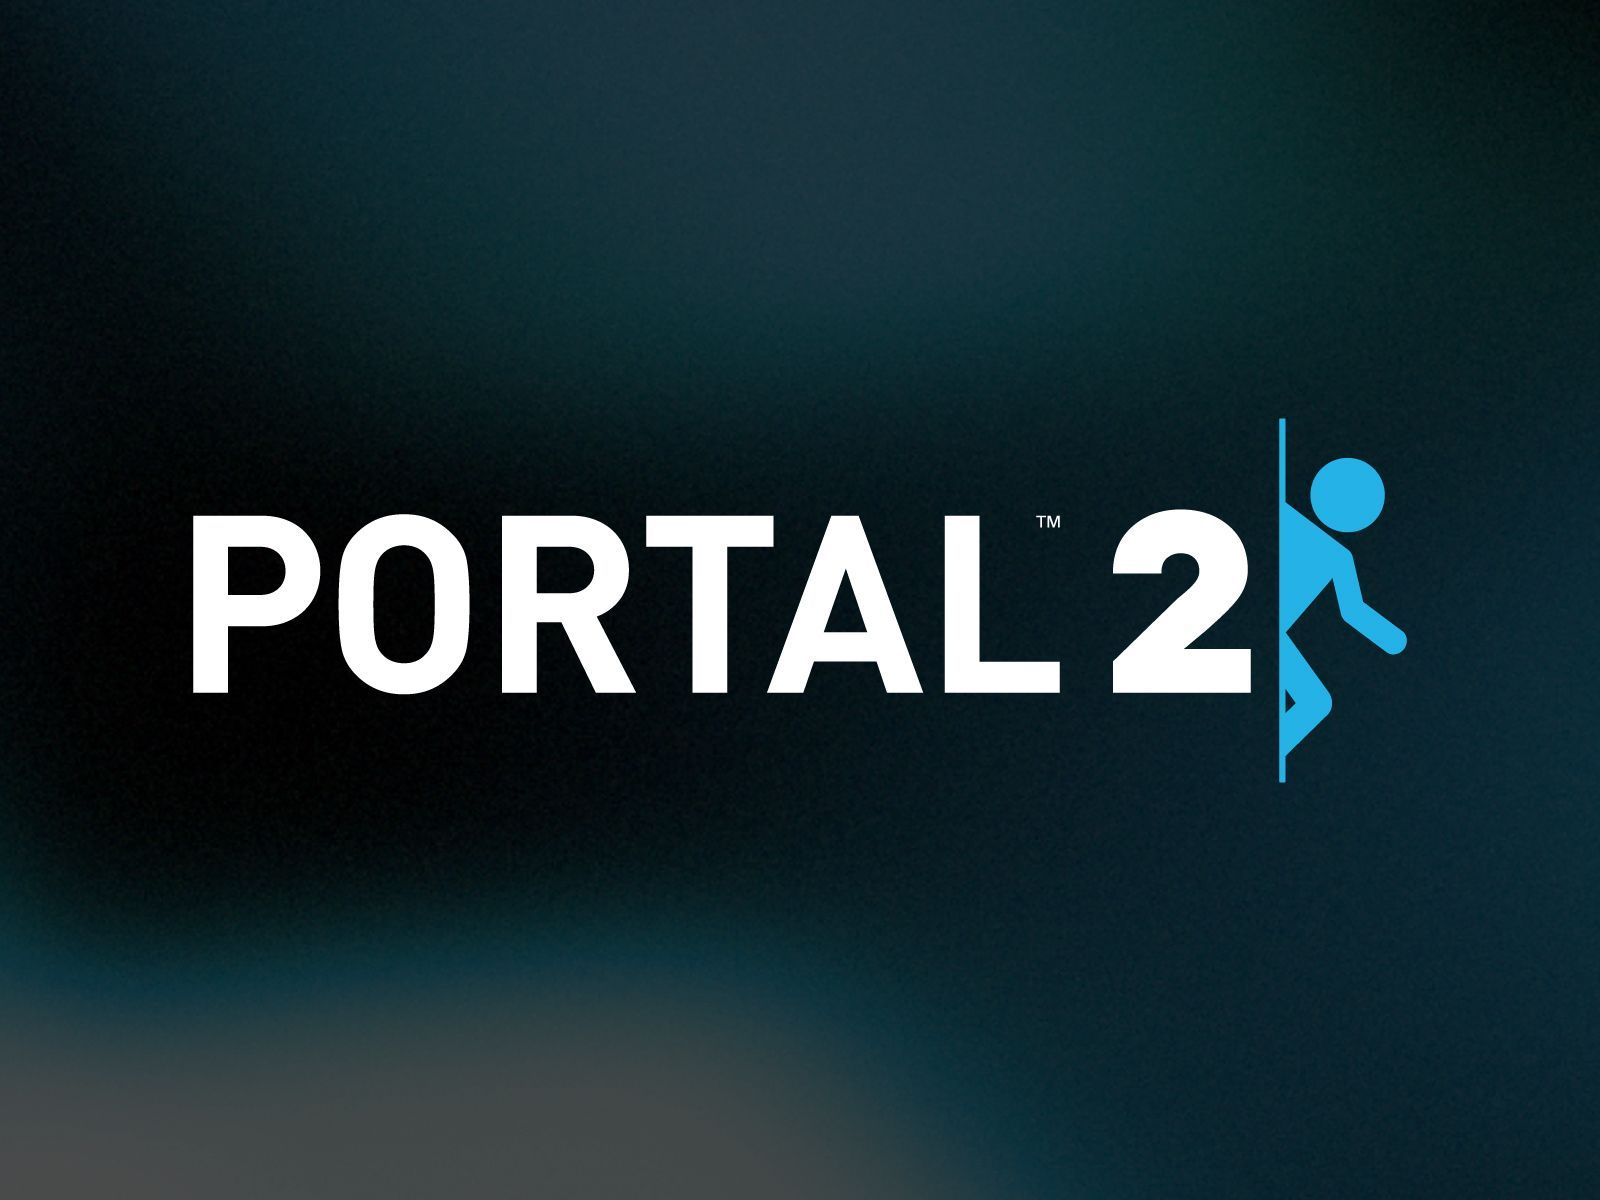 Valve_reject_lan_game portal 2 skidrow ffx runner 2 racing games